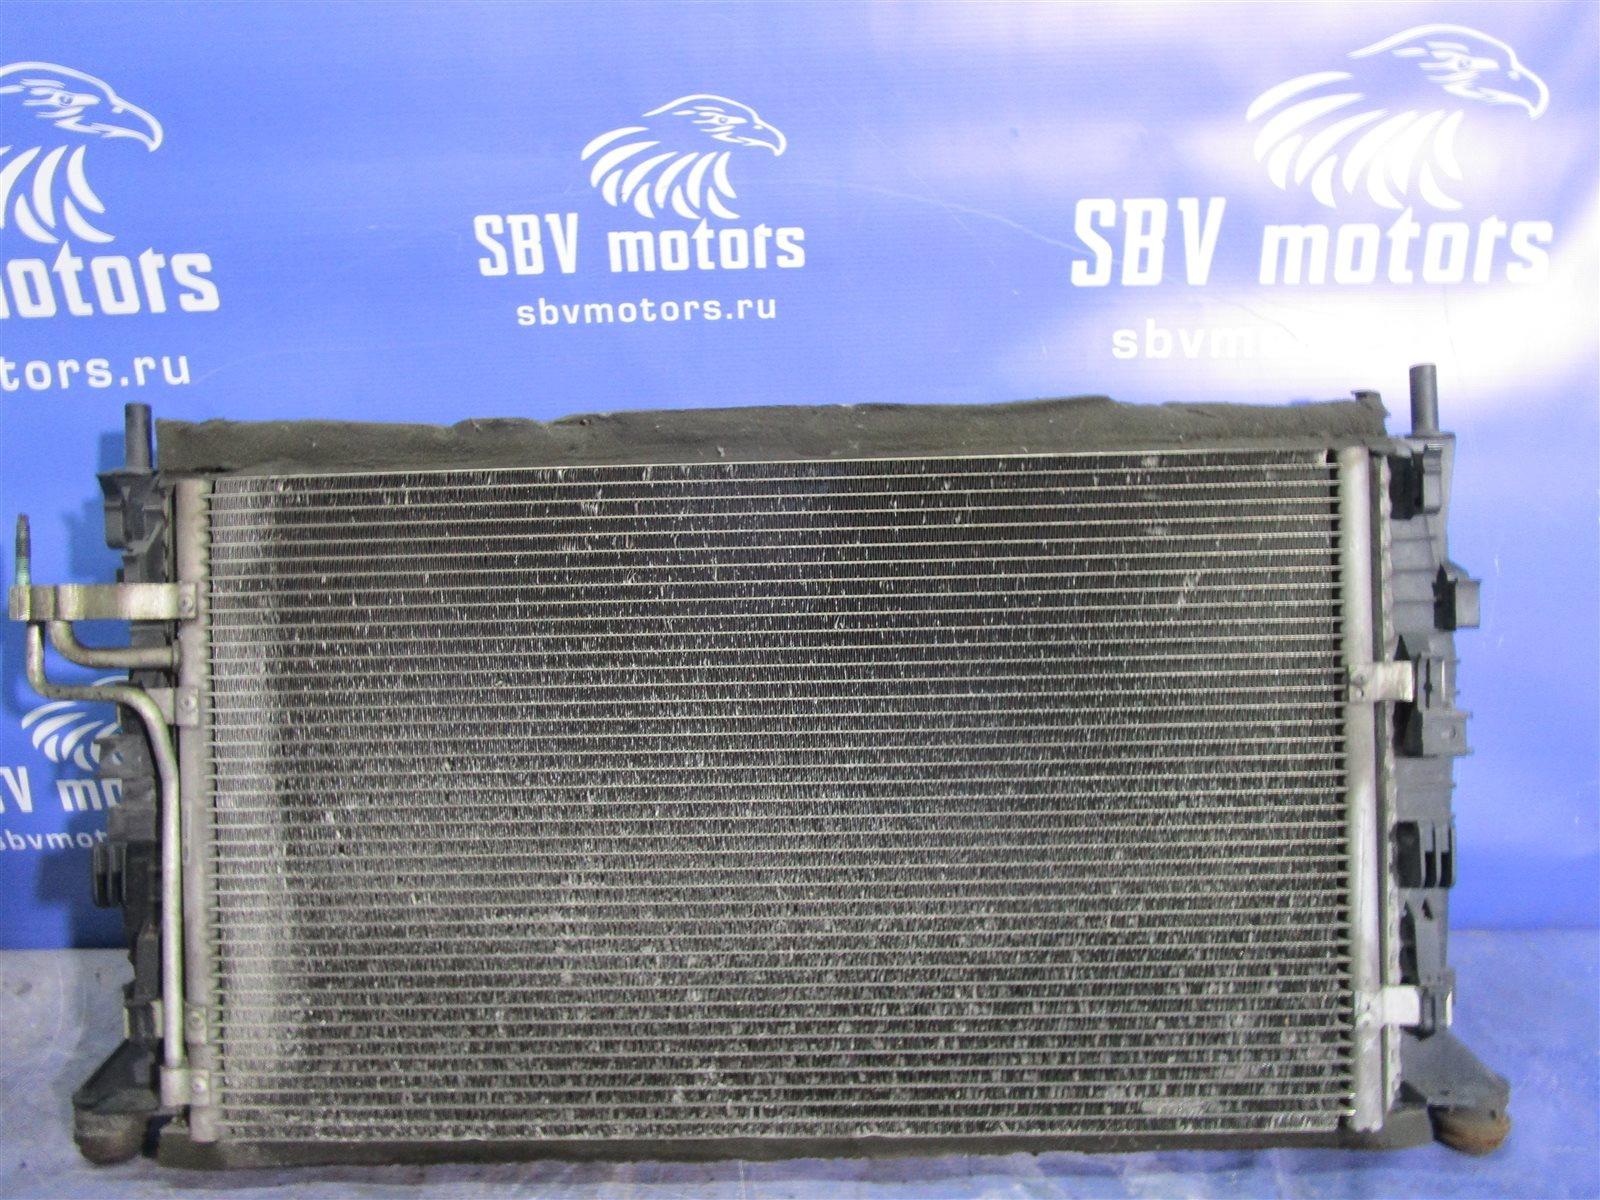 Вентилятор радиатора Ford Focus HATCH SHDA 1.6 DURATEС 100 ЛС 2009г.